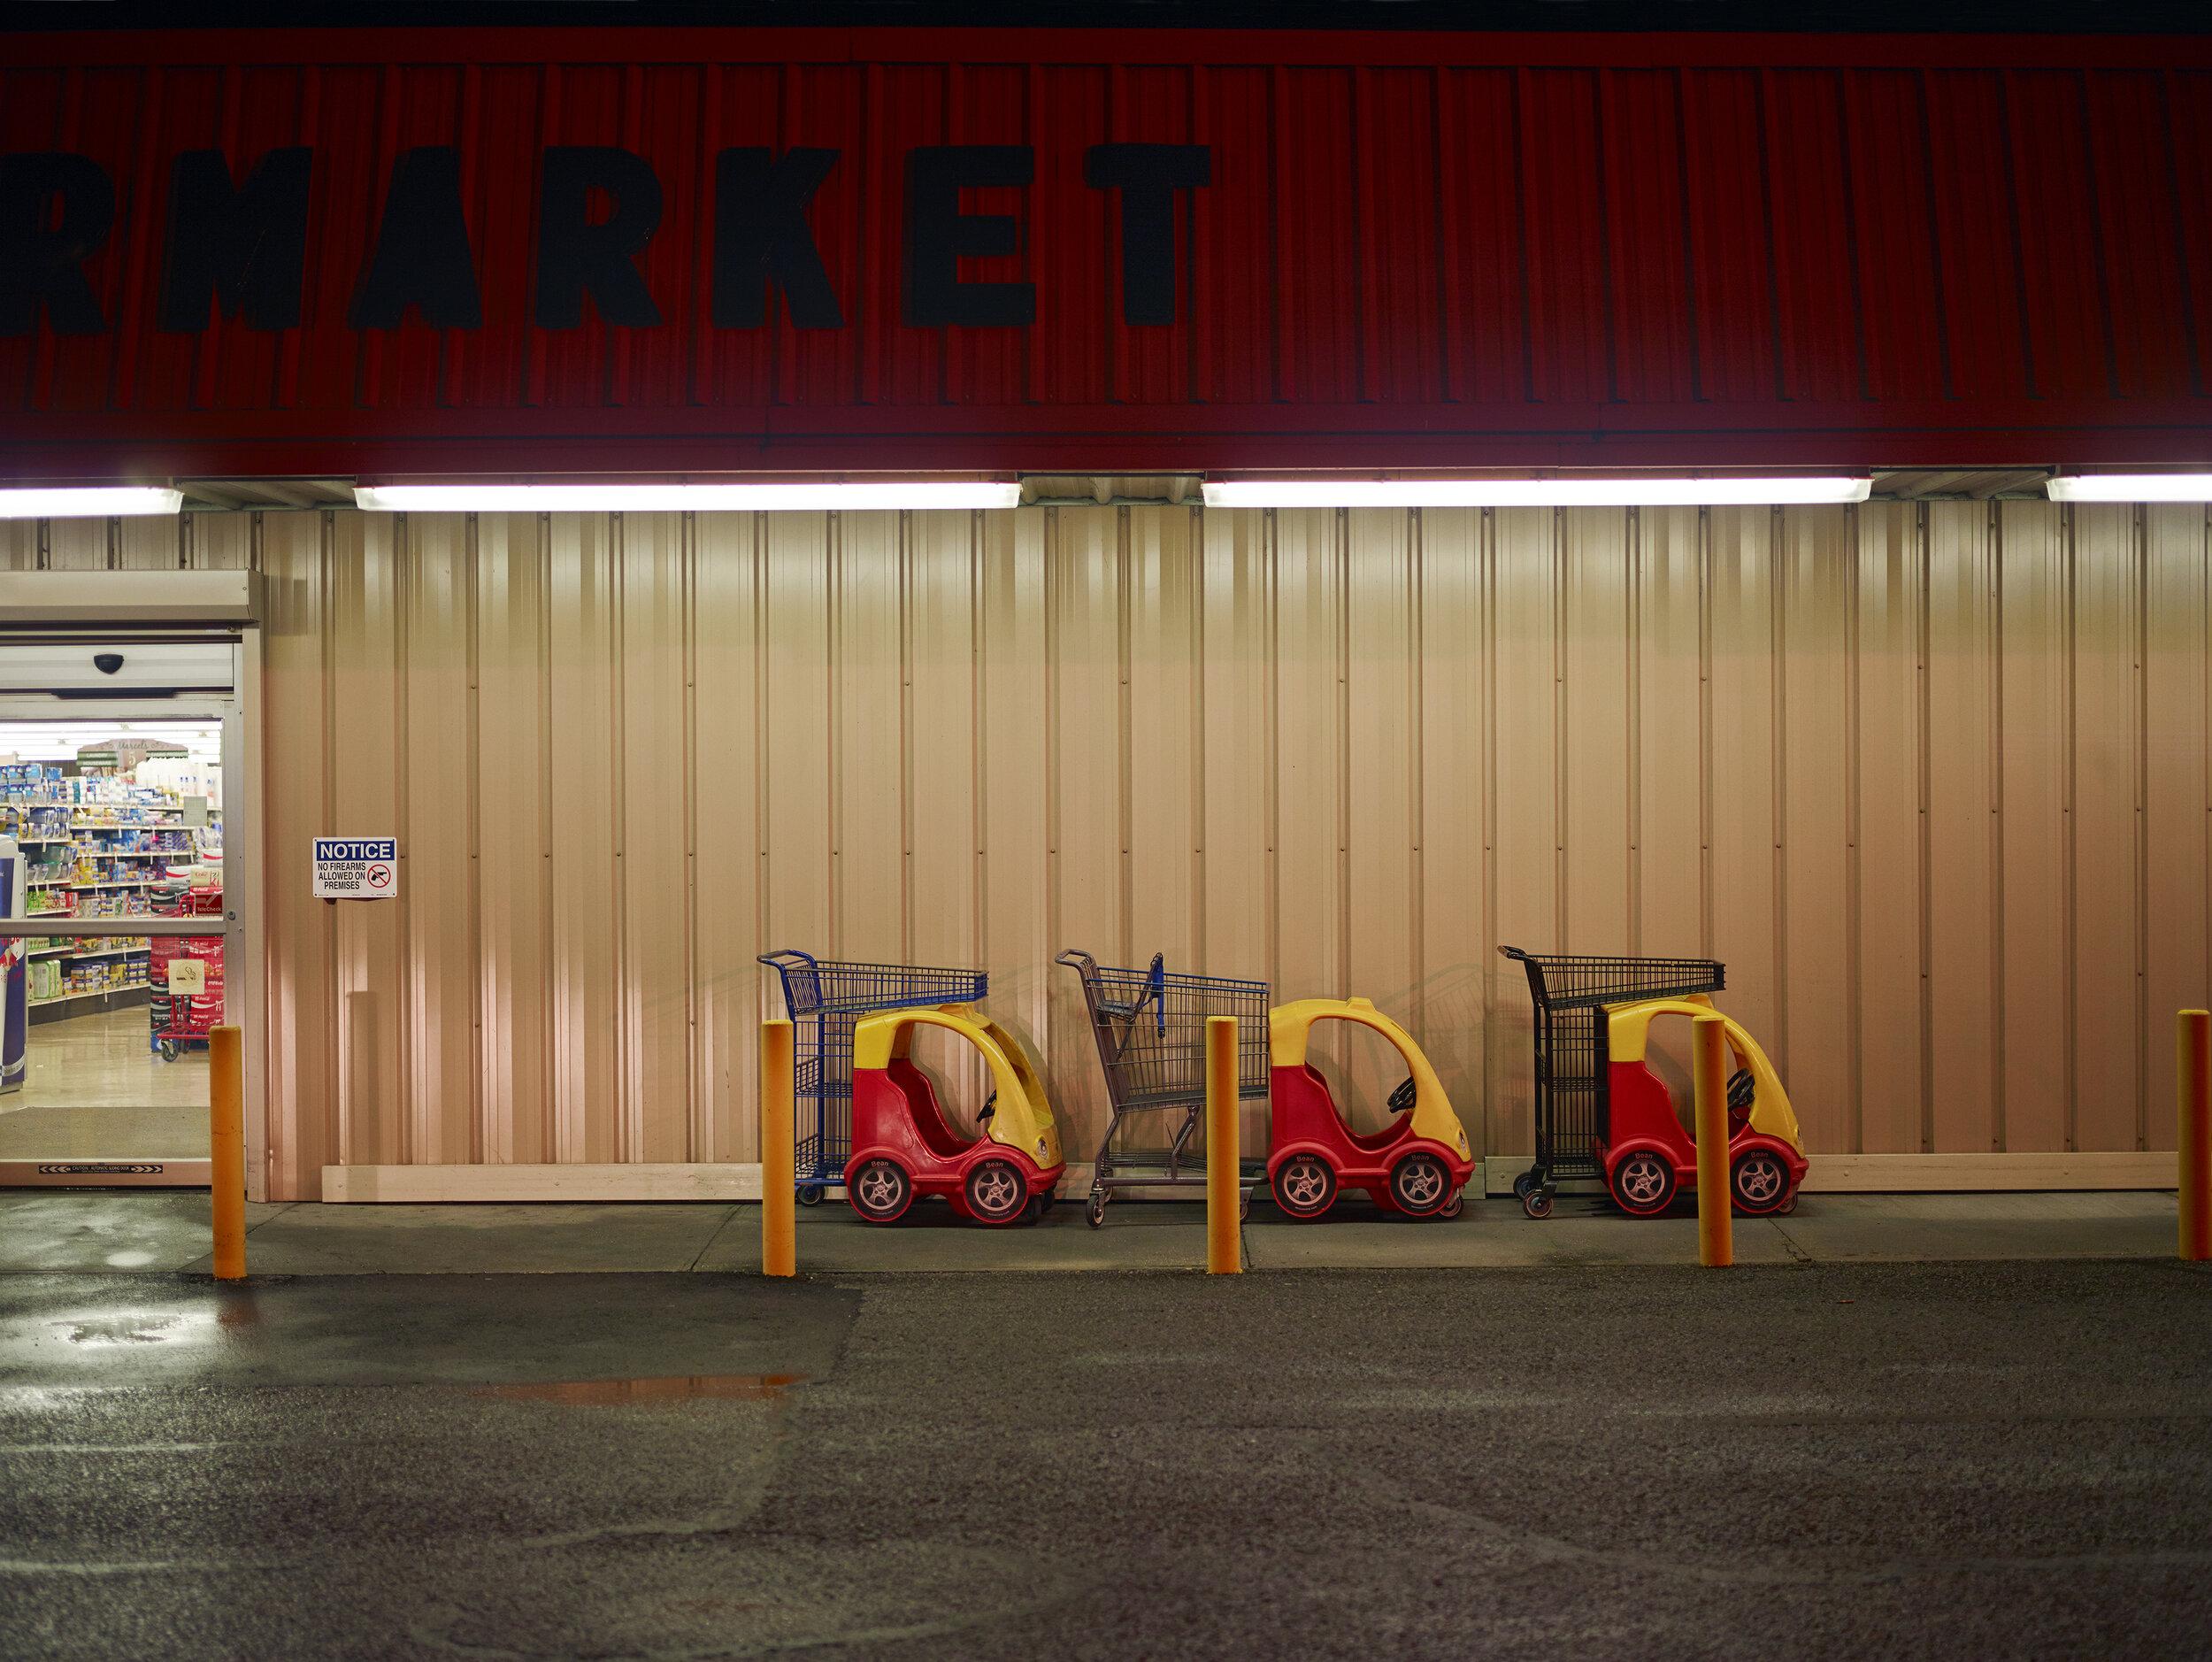 Copy of Supermarket Carts